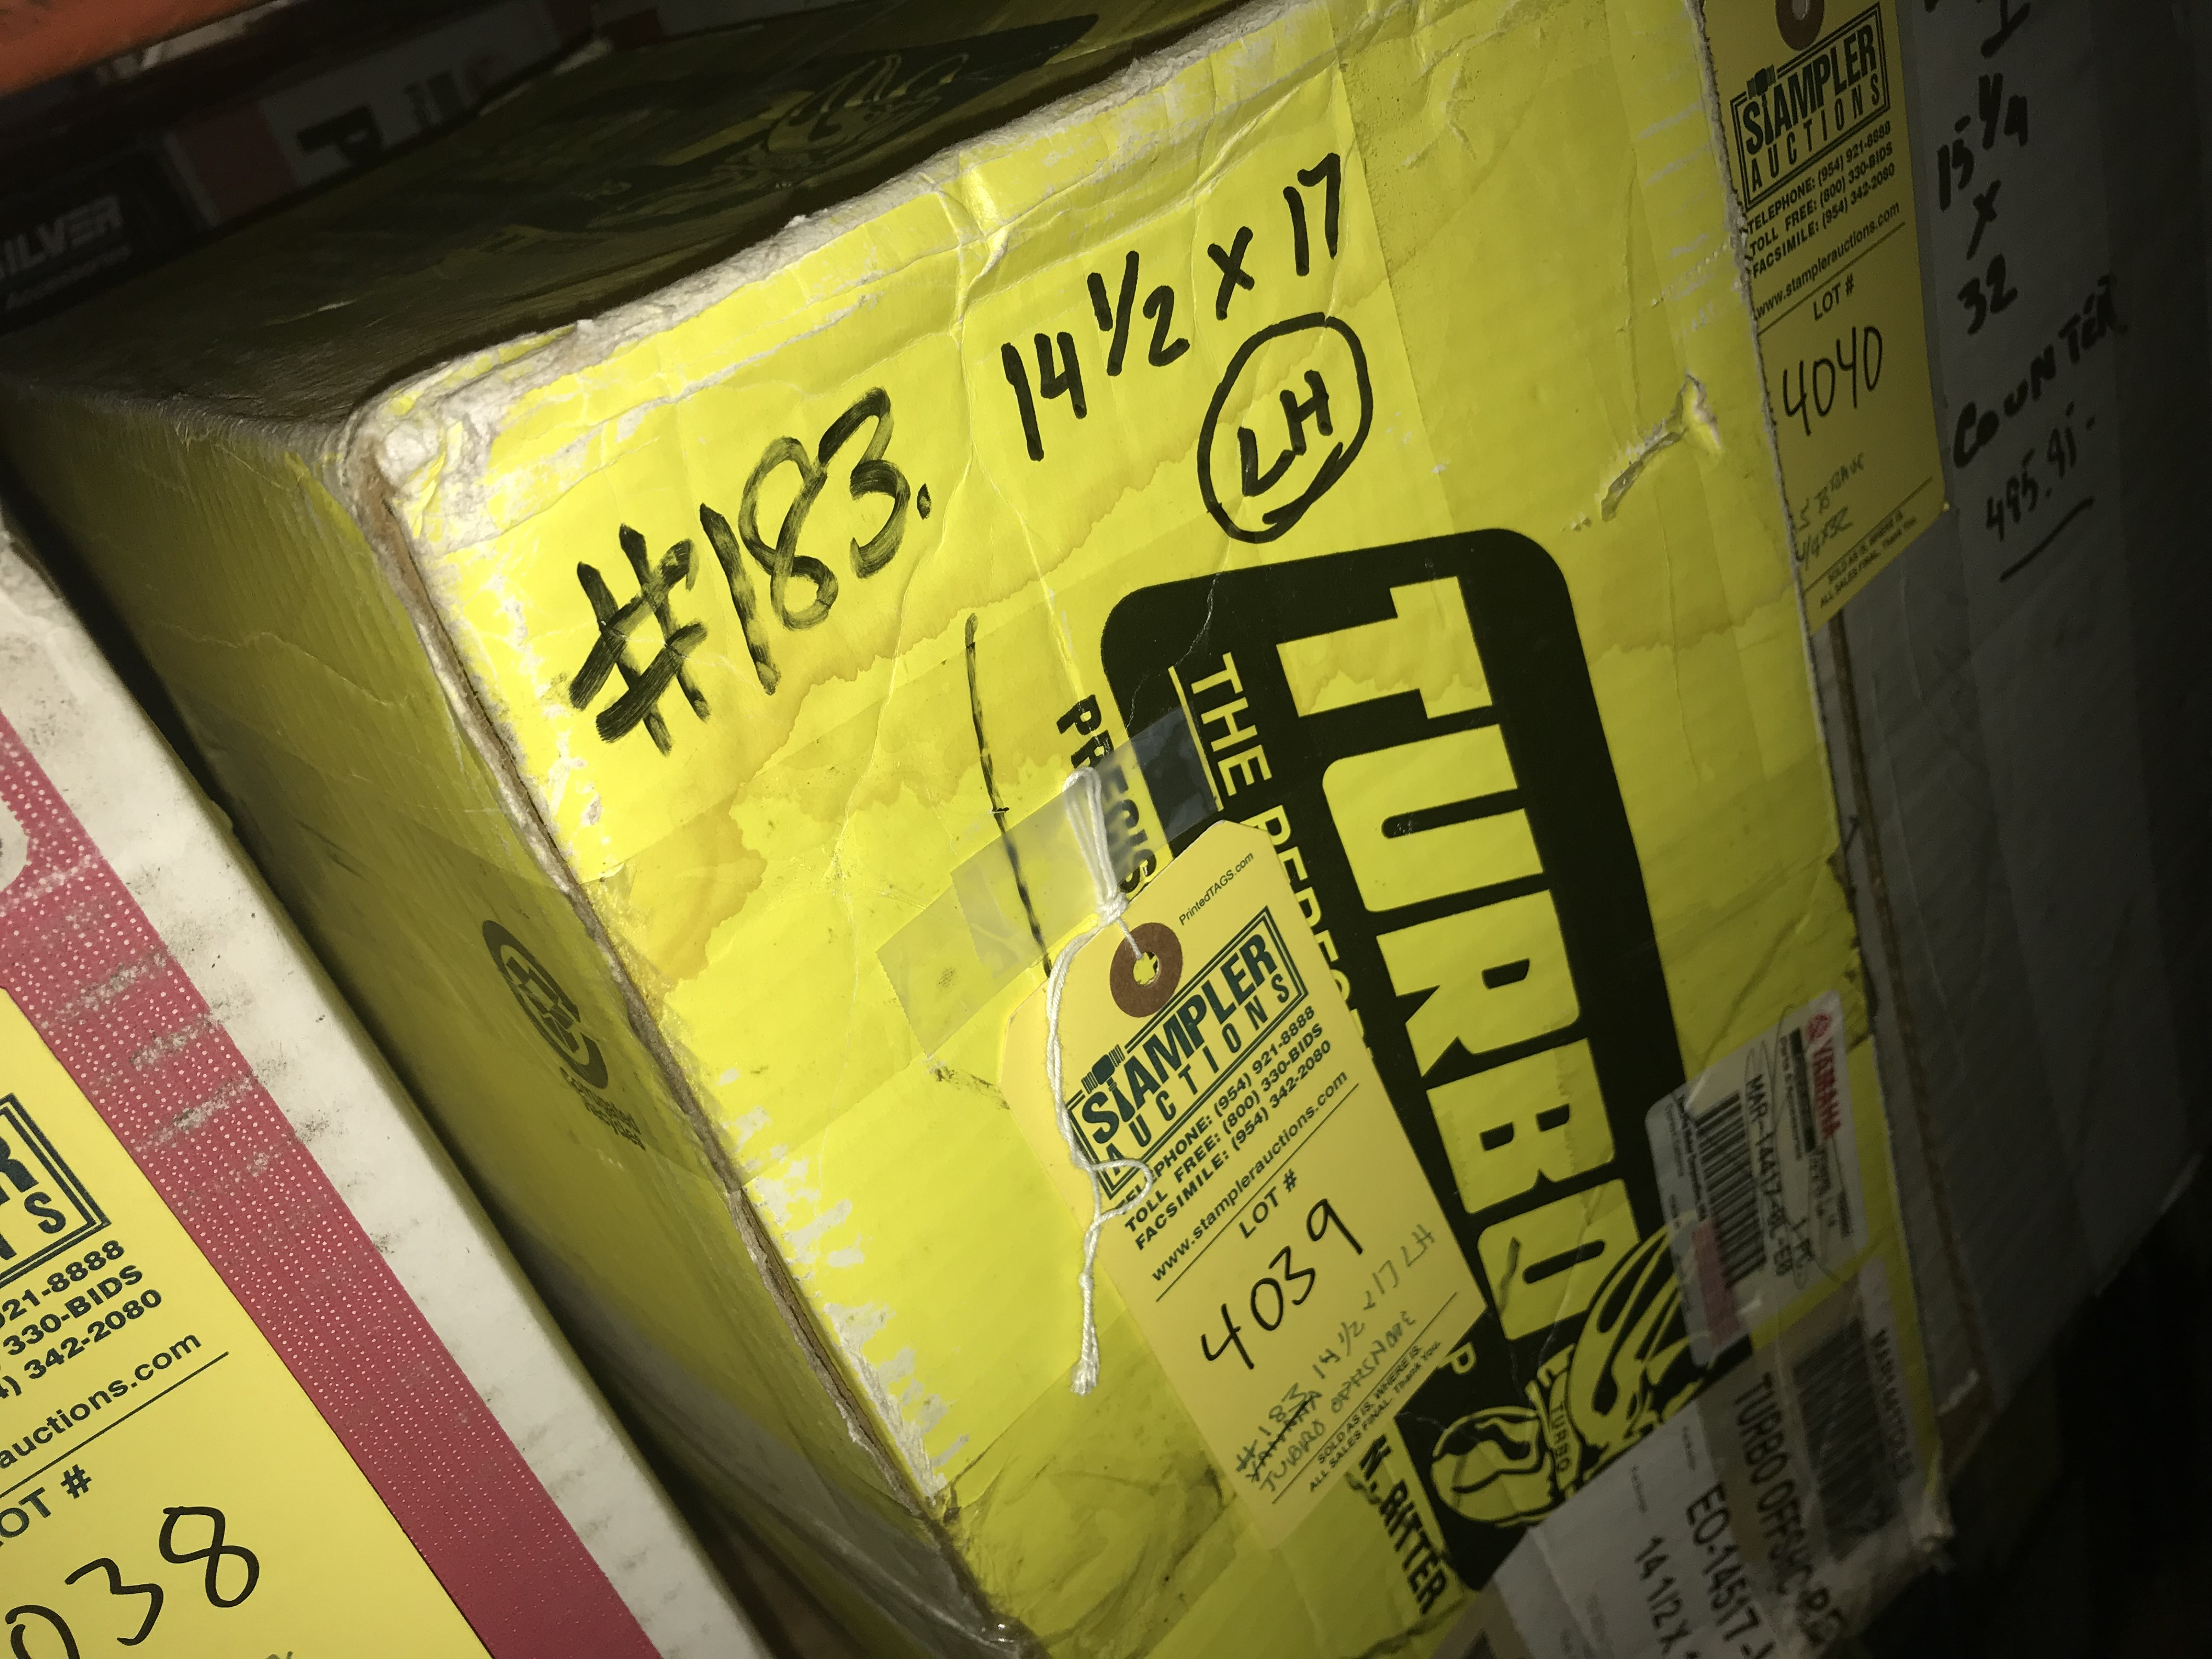 Lot 4039 - TURBO OFFSHORE LH PROPELLER - 14.5x17